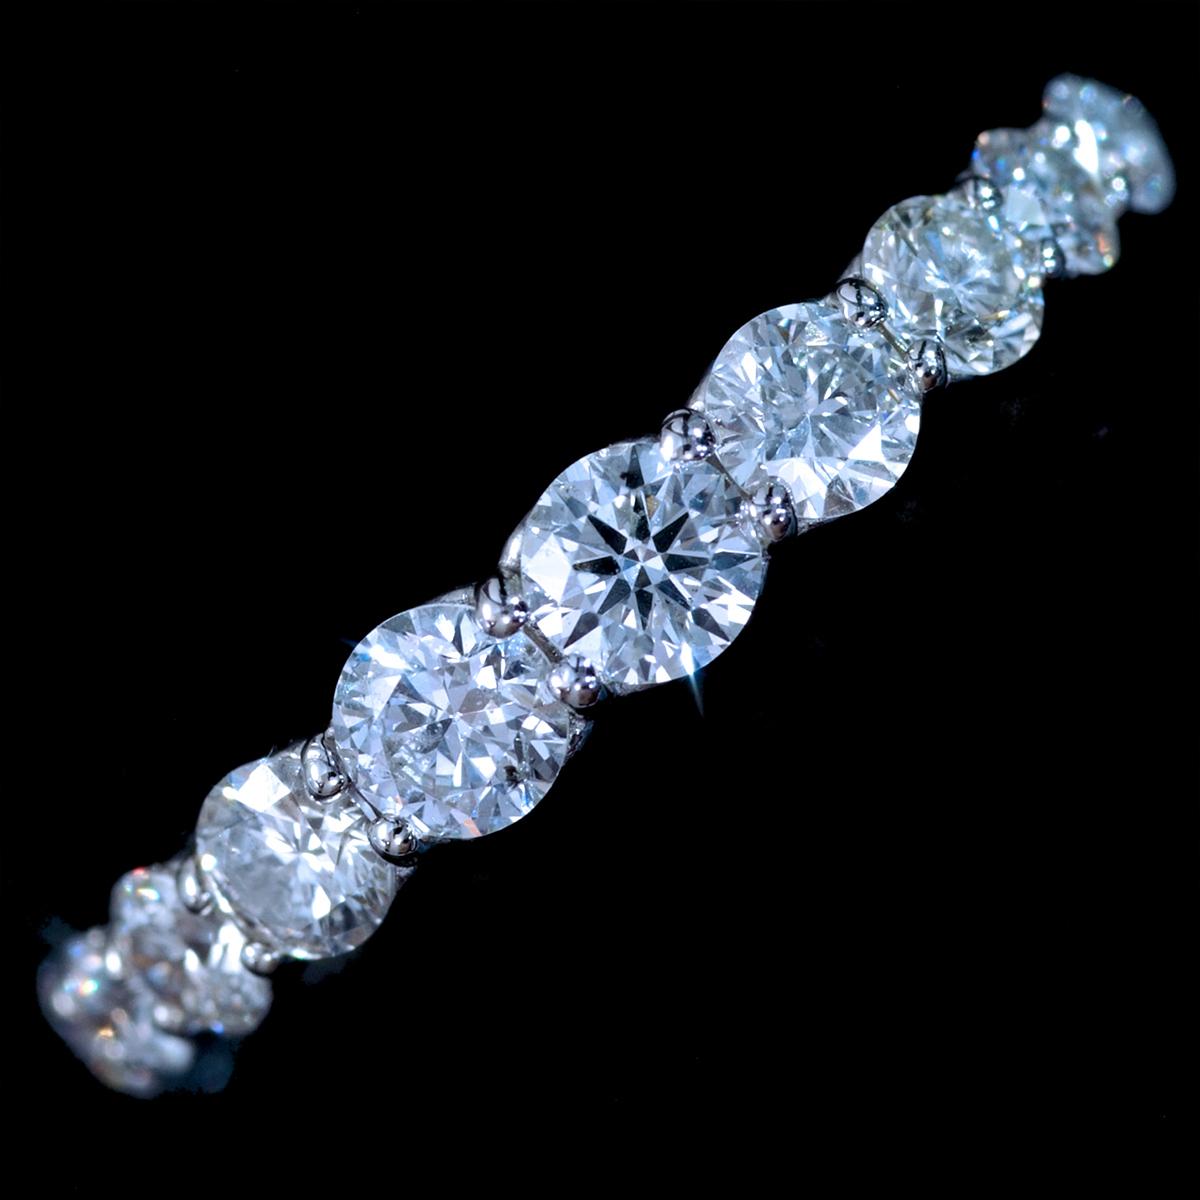 *R3558 新品!業者向け令和新作Design! 天然大粒上質ダイヤモンド1.00ct 最高級Pt900無垢リング サイズ12號 重量3.0g 縦幅3.4mm